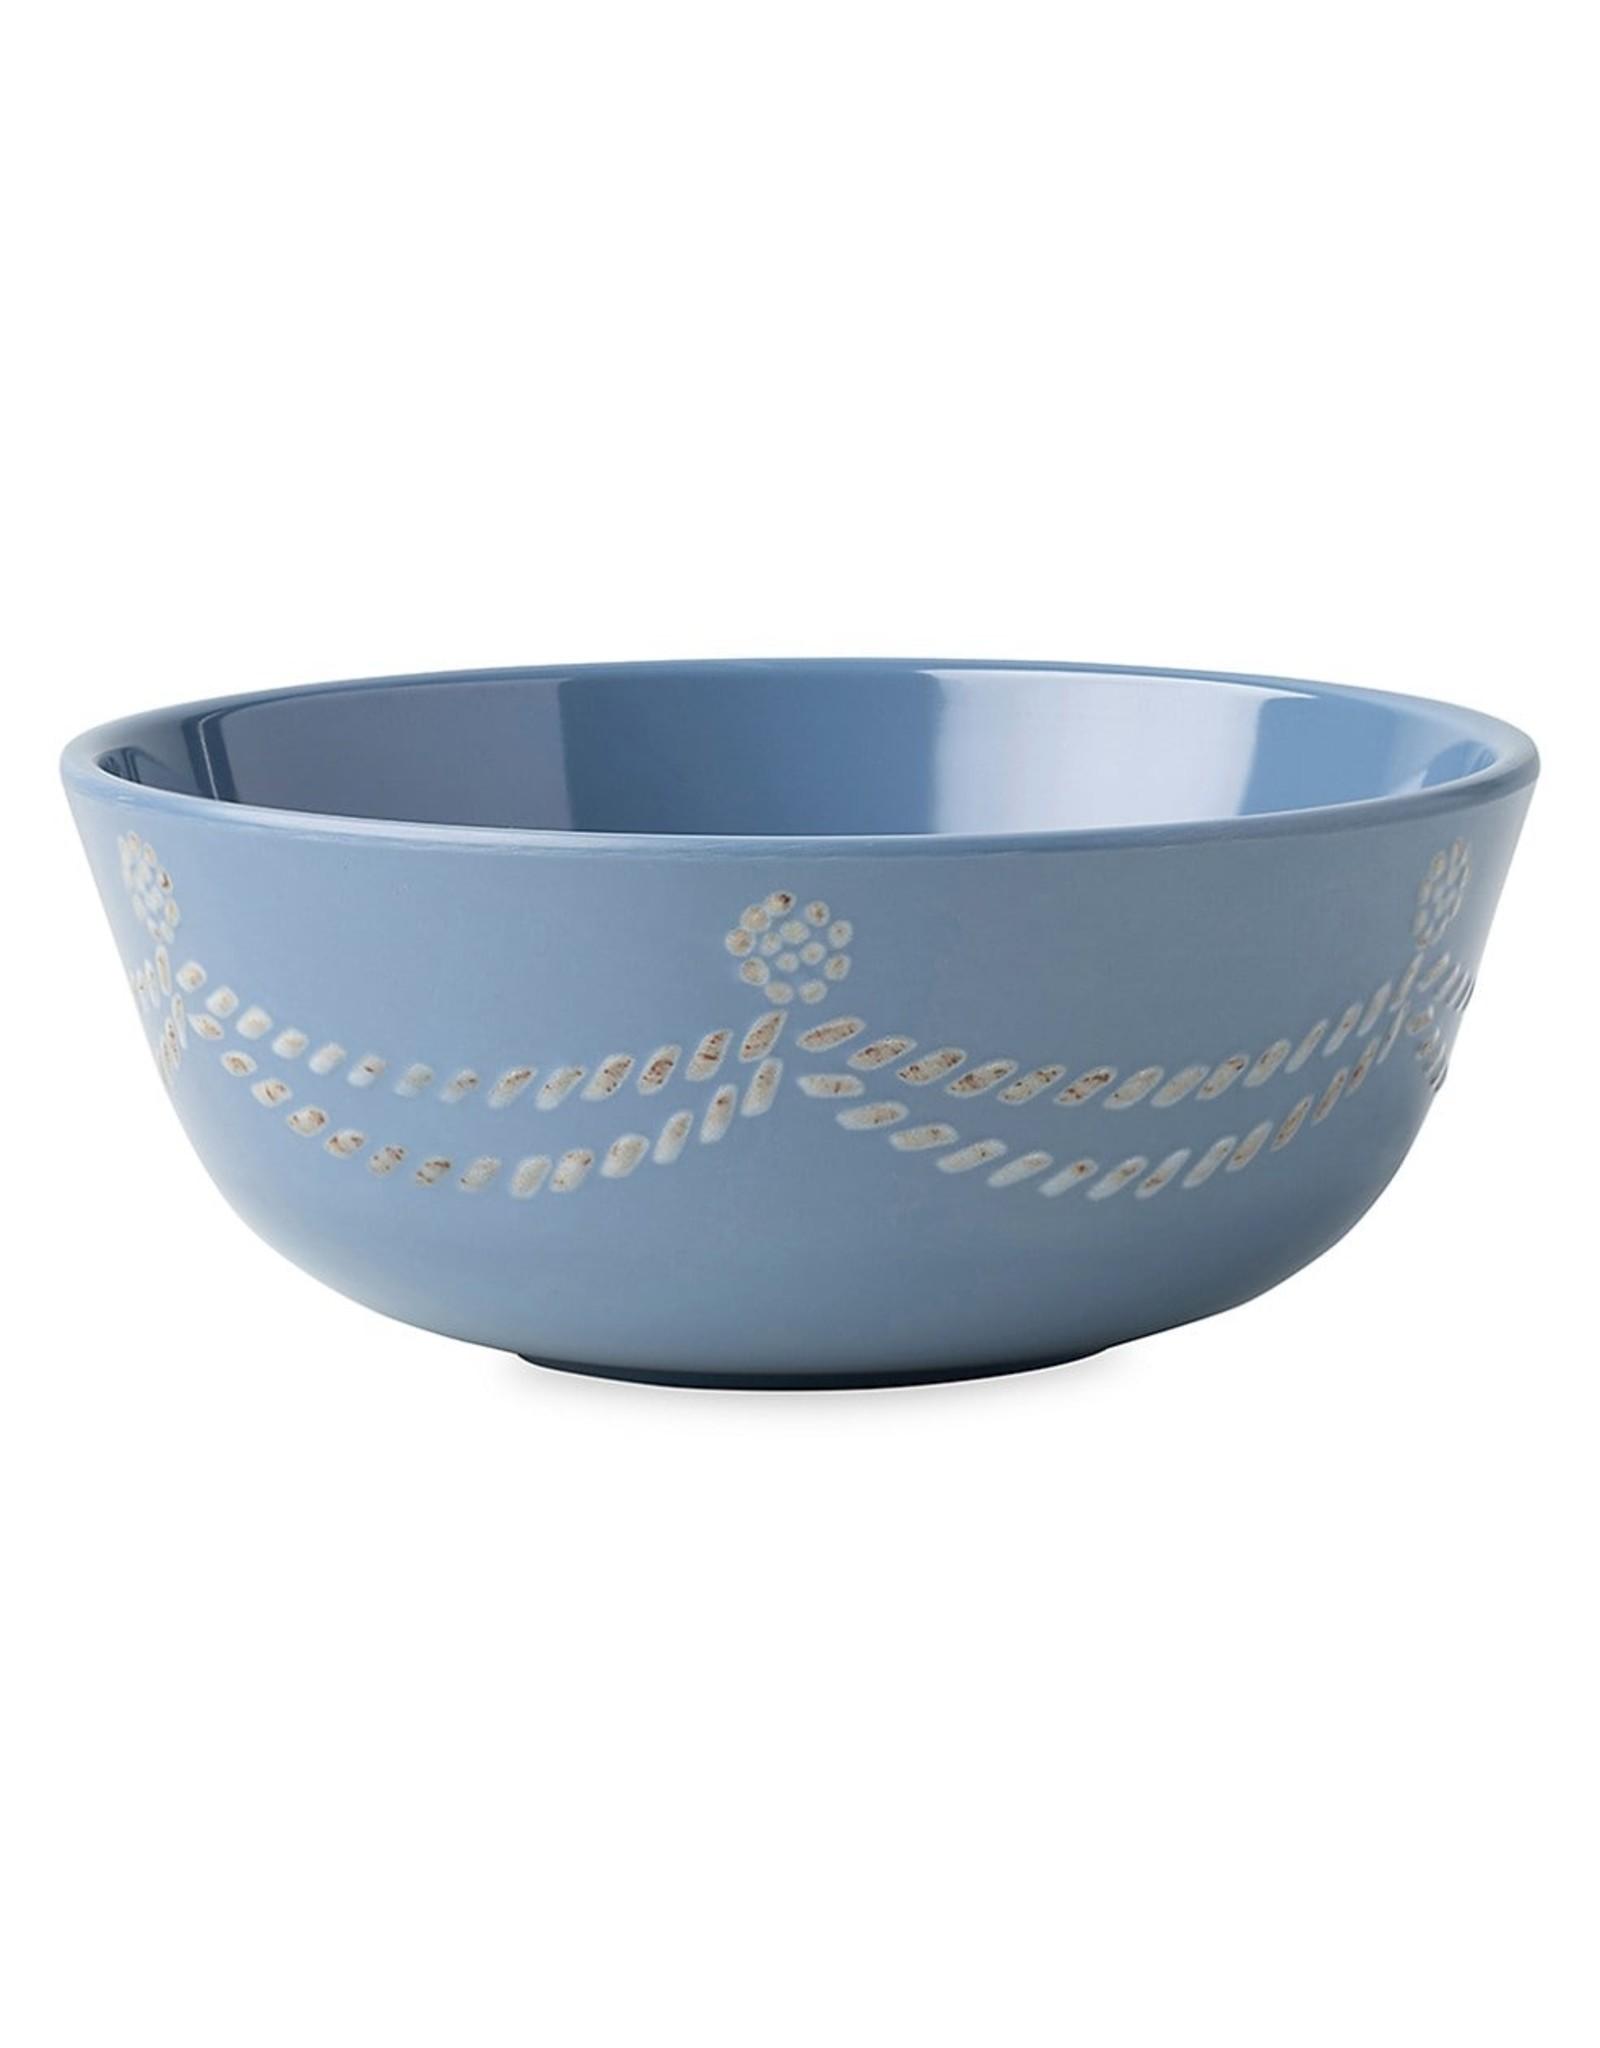 Juliska Melamine Chambray Cereal Bowl